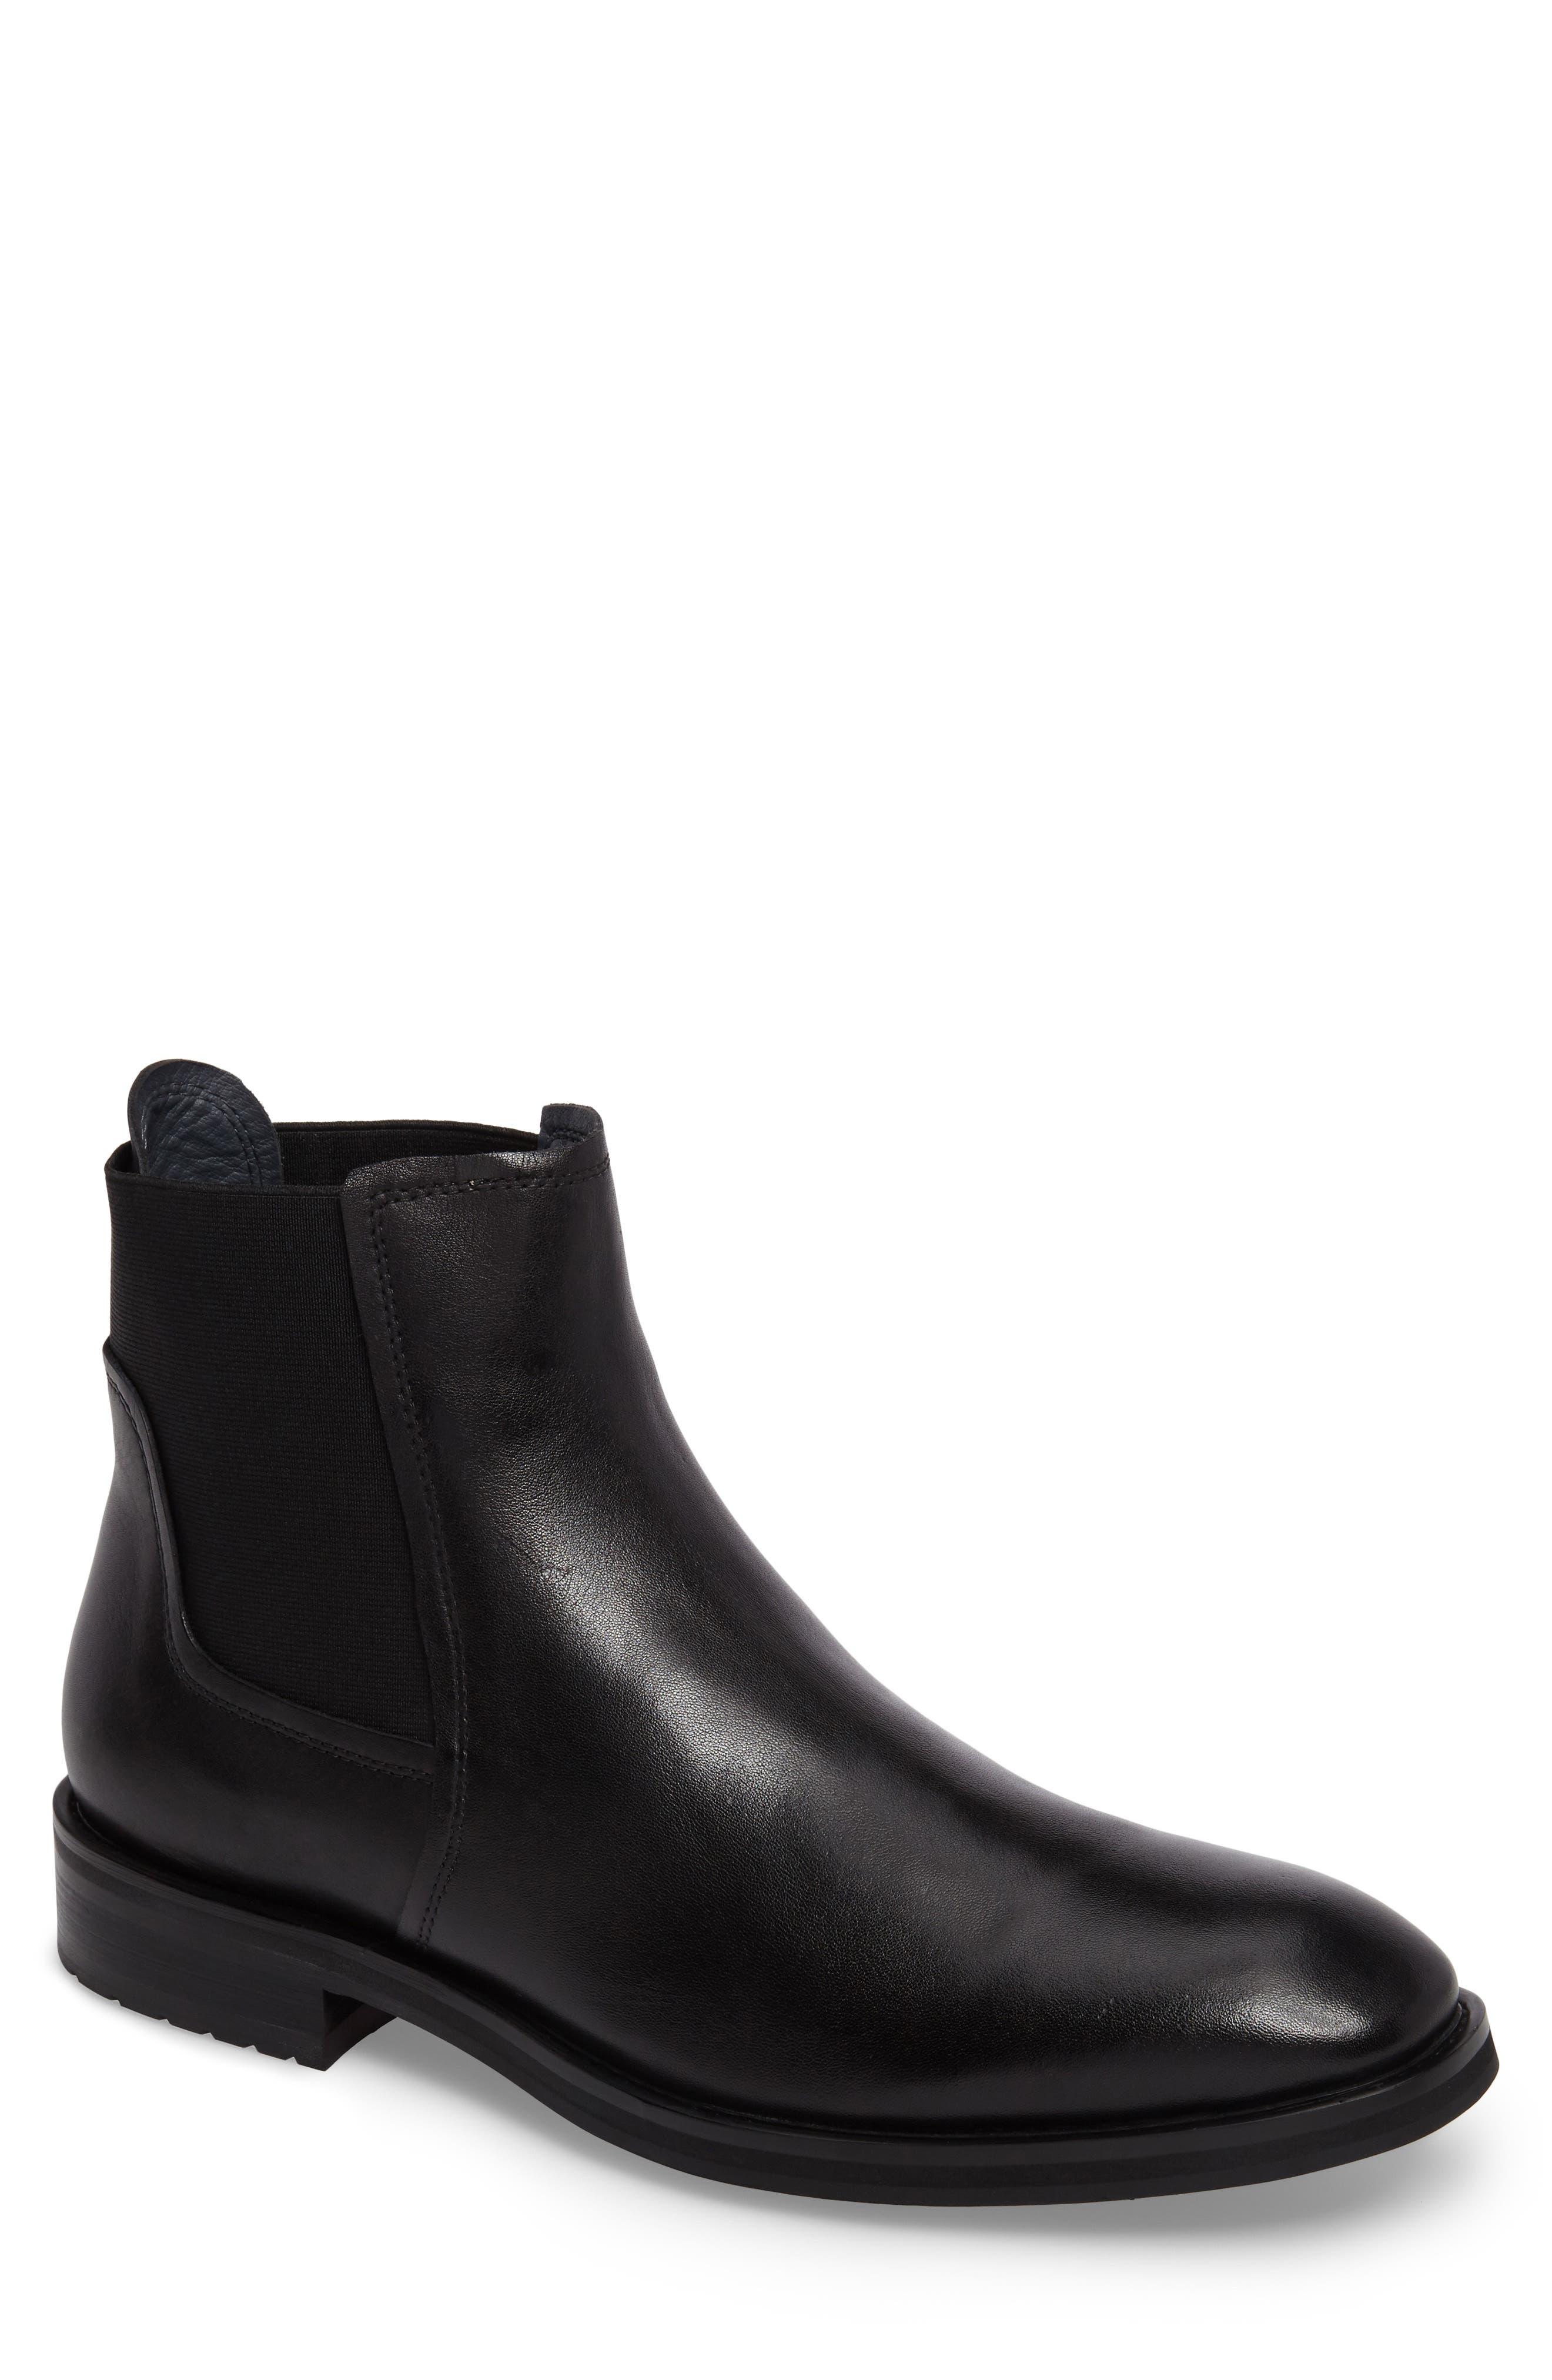 Belmont Chelsea Boot,                             Main thumbnail 1, color,                             Black Leather